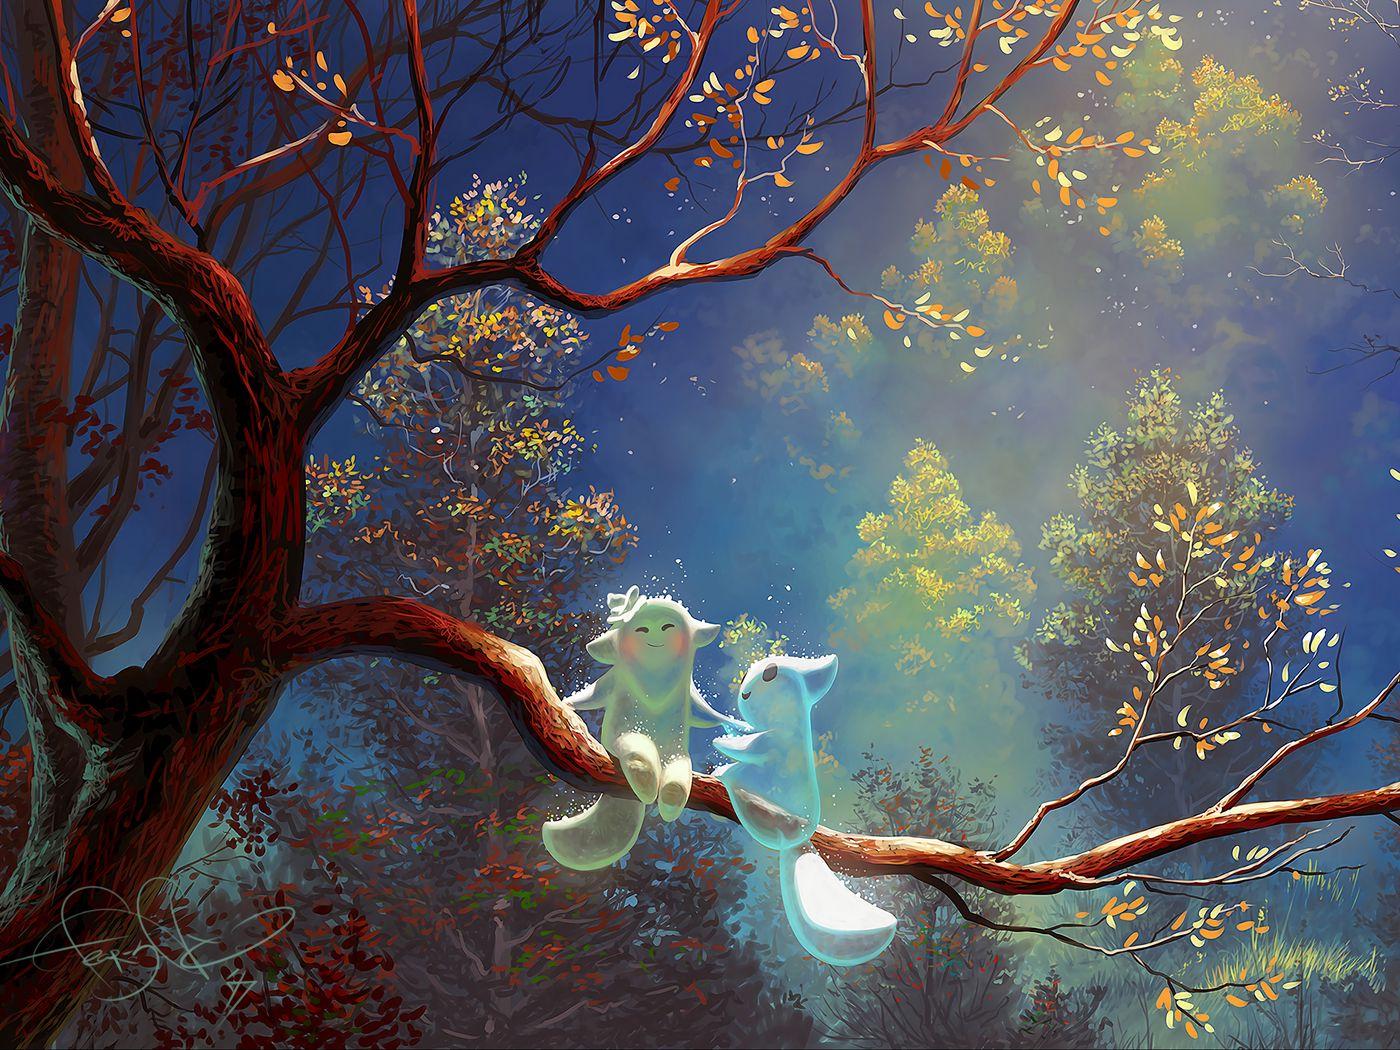 1400x1050 Wallpaper animals, tree, branch, magic, art, fantasy